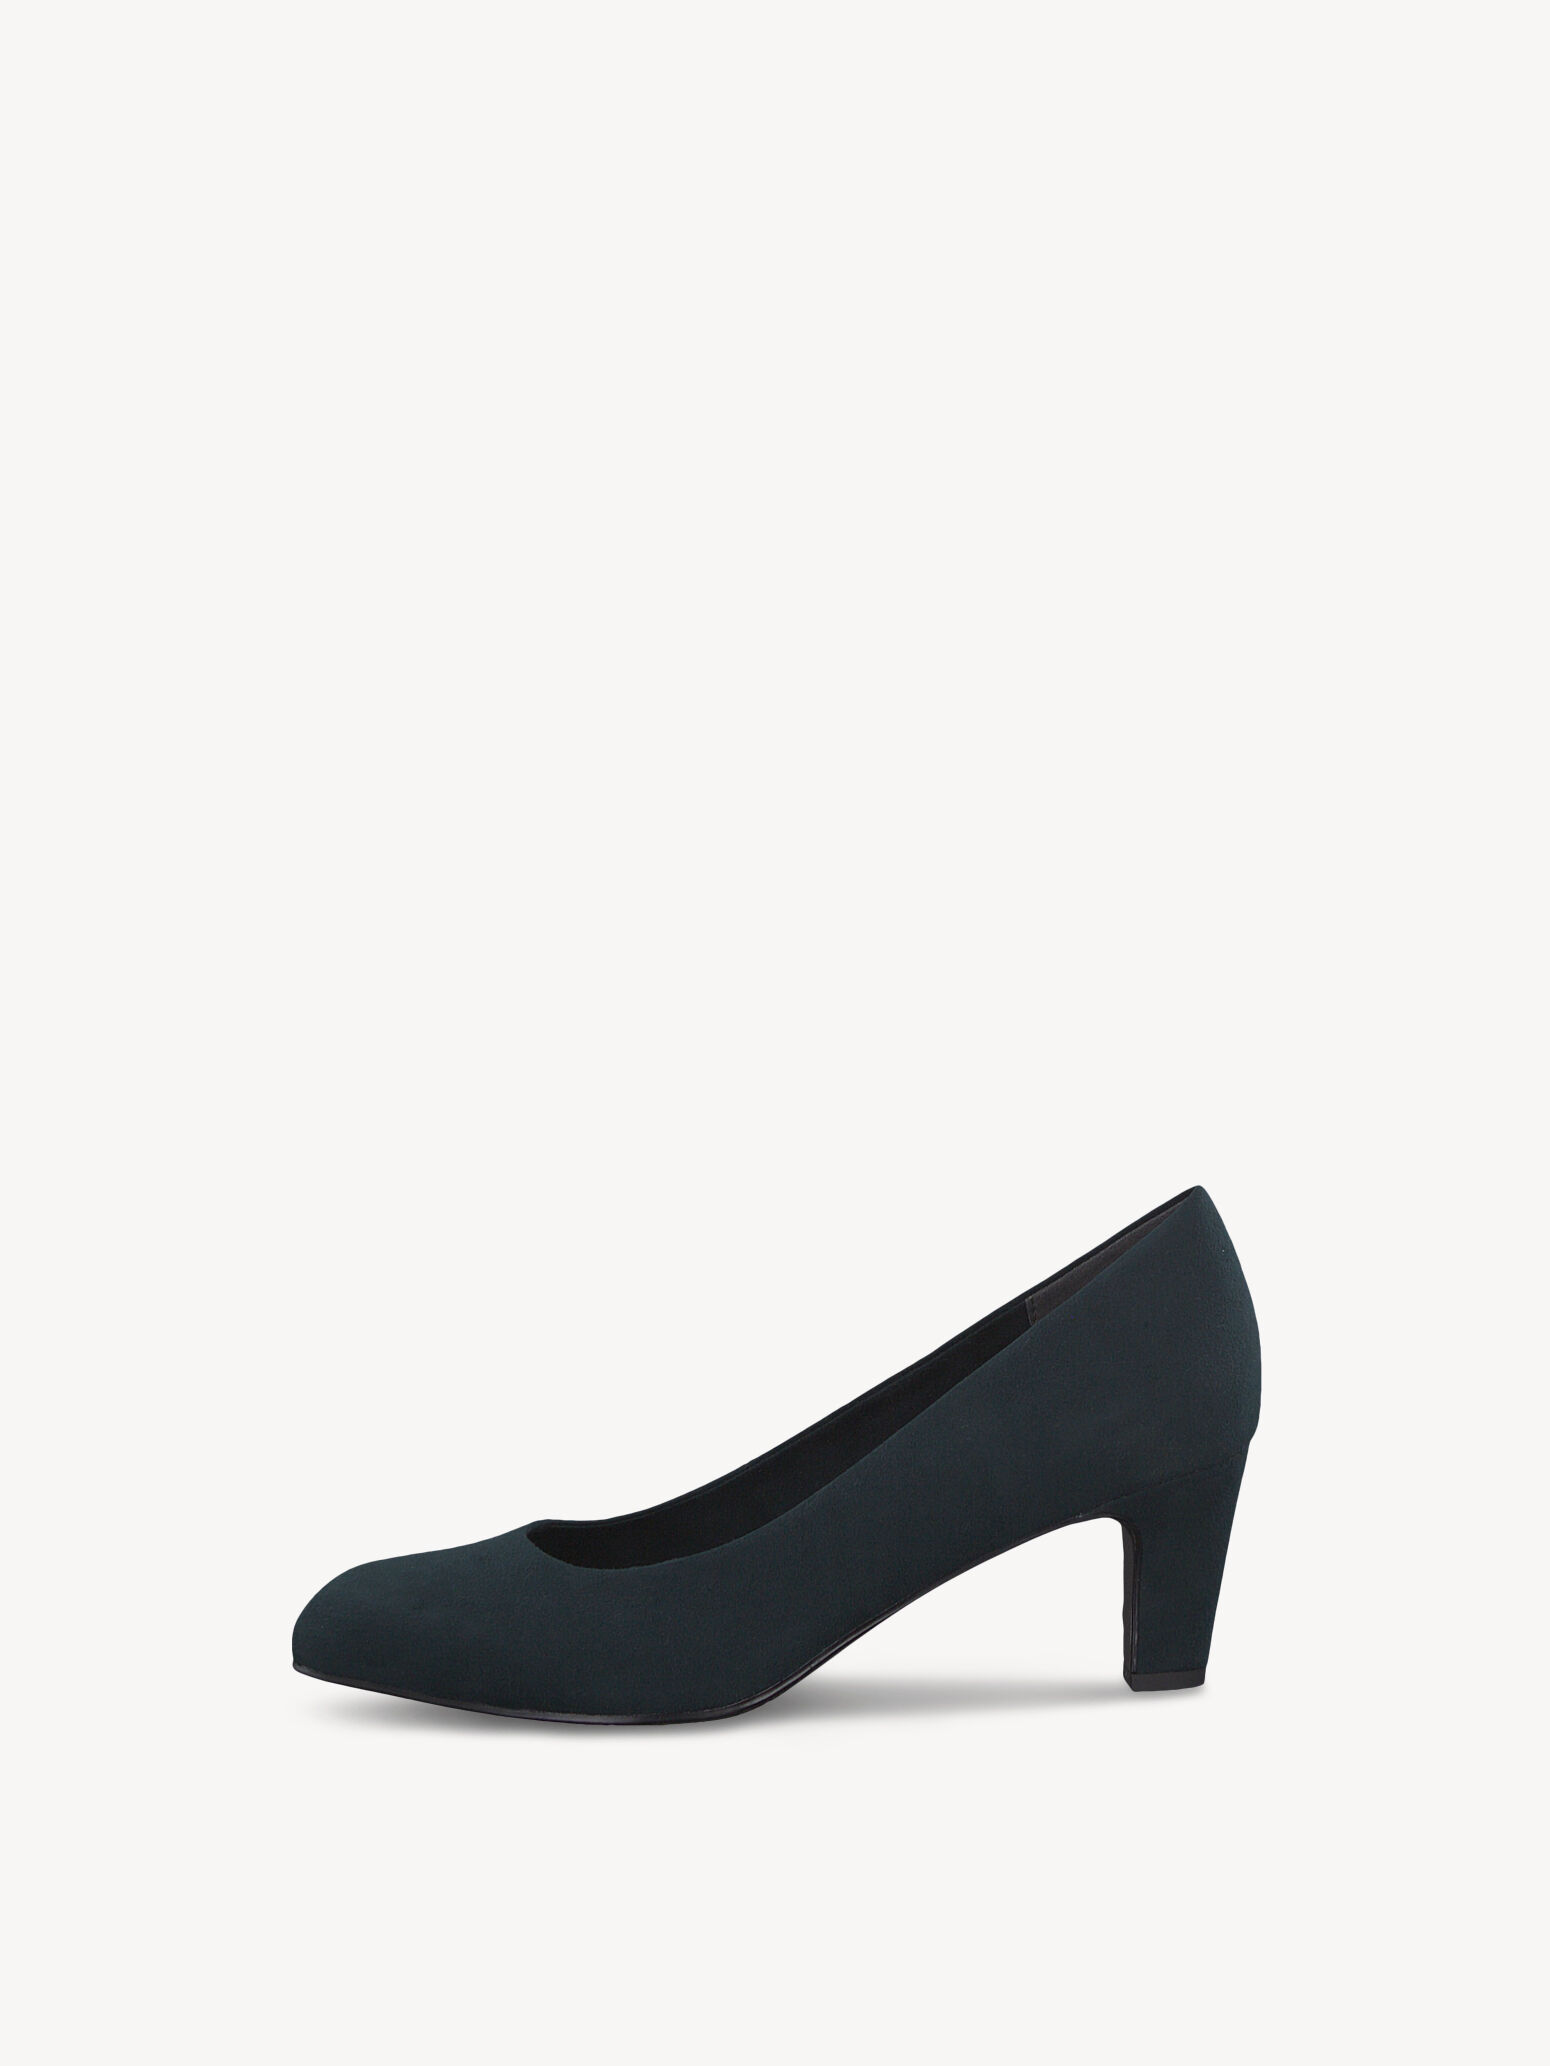 Escarpins Tamaris chaussures femmes